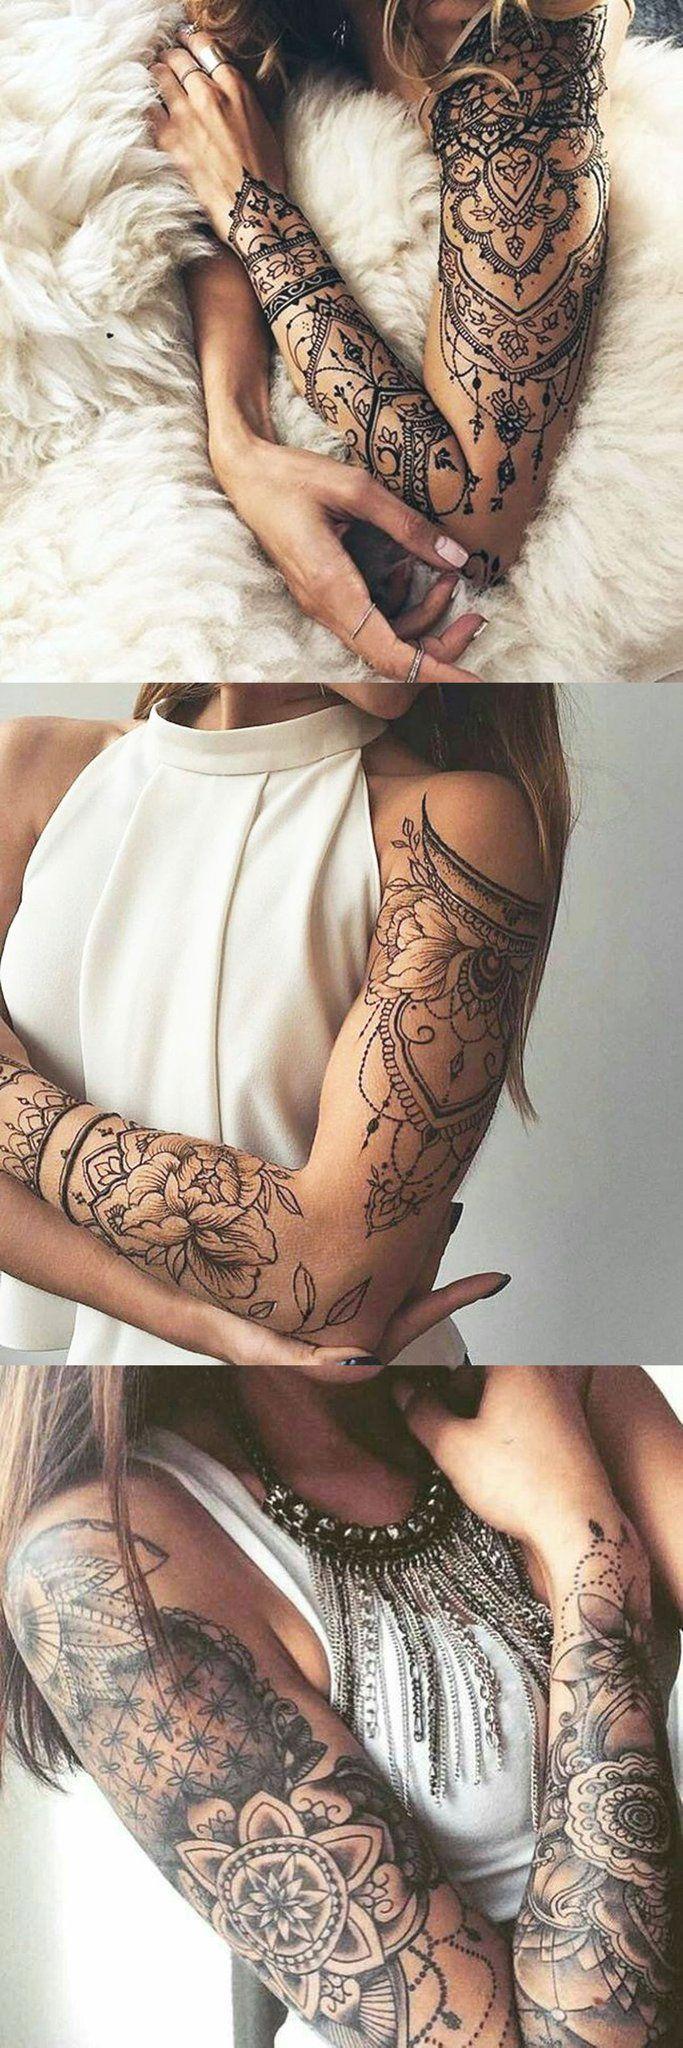 Lotus Arm Sleeve Tattoo Ideas for Women at MyBodiArt.com - Tribal Mandala Arm Bicep Tatt